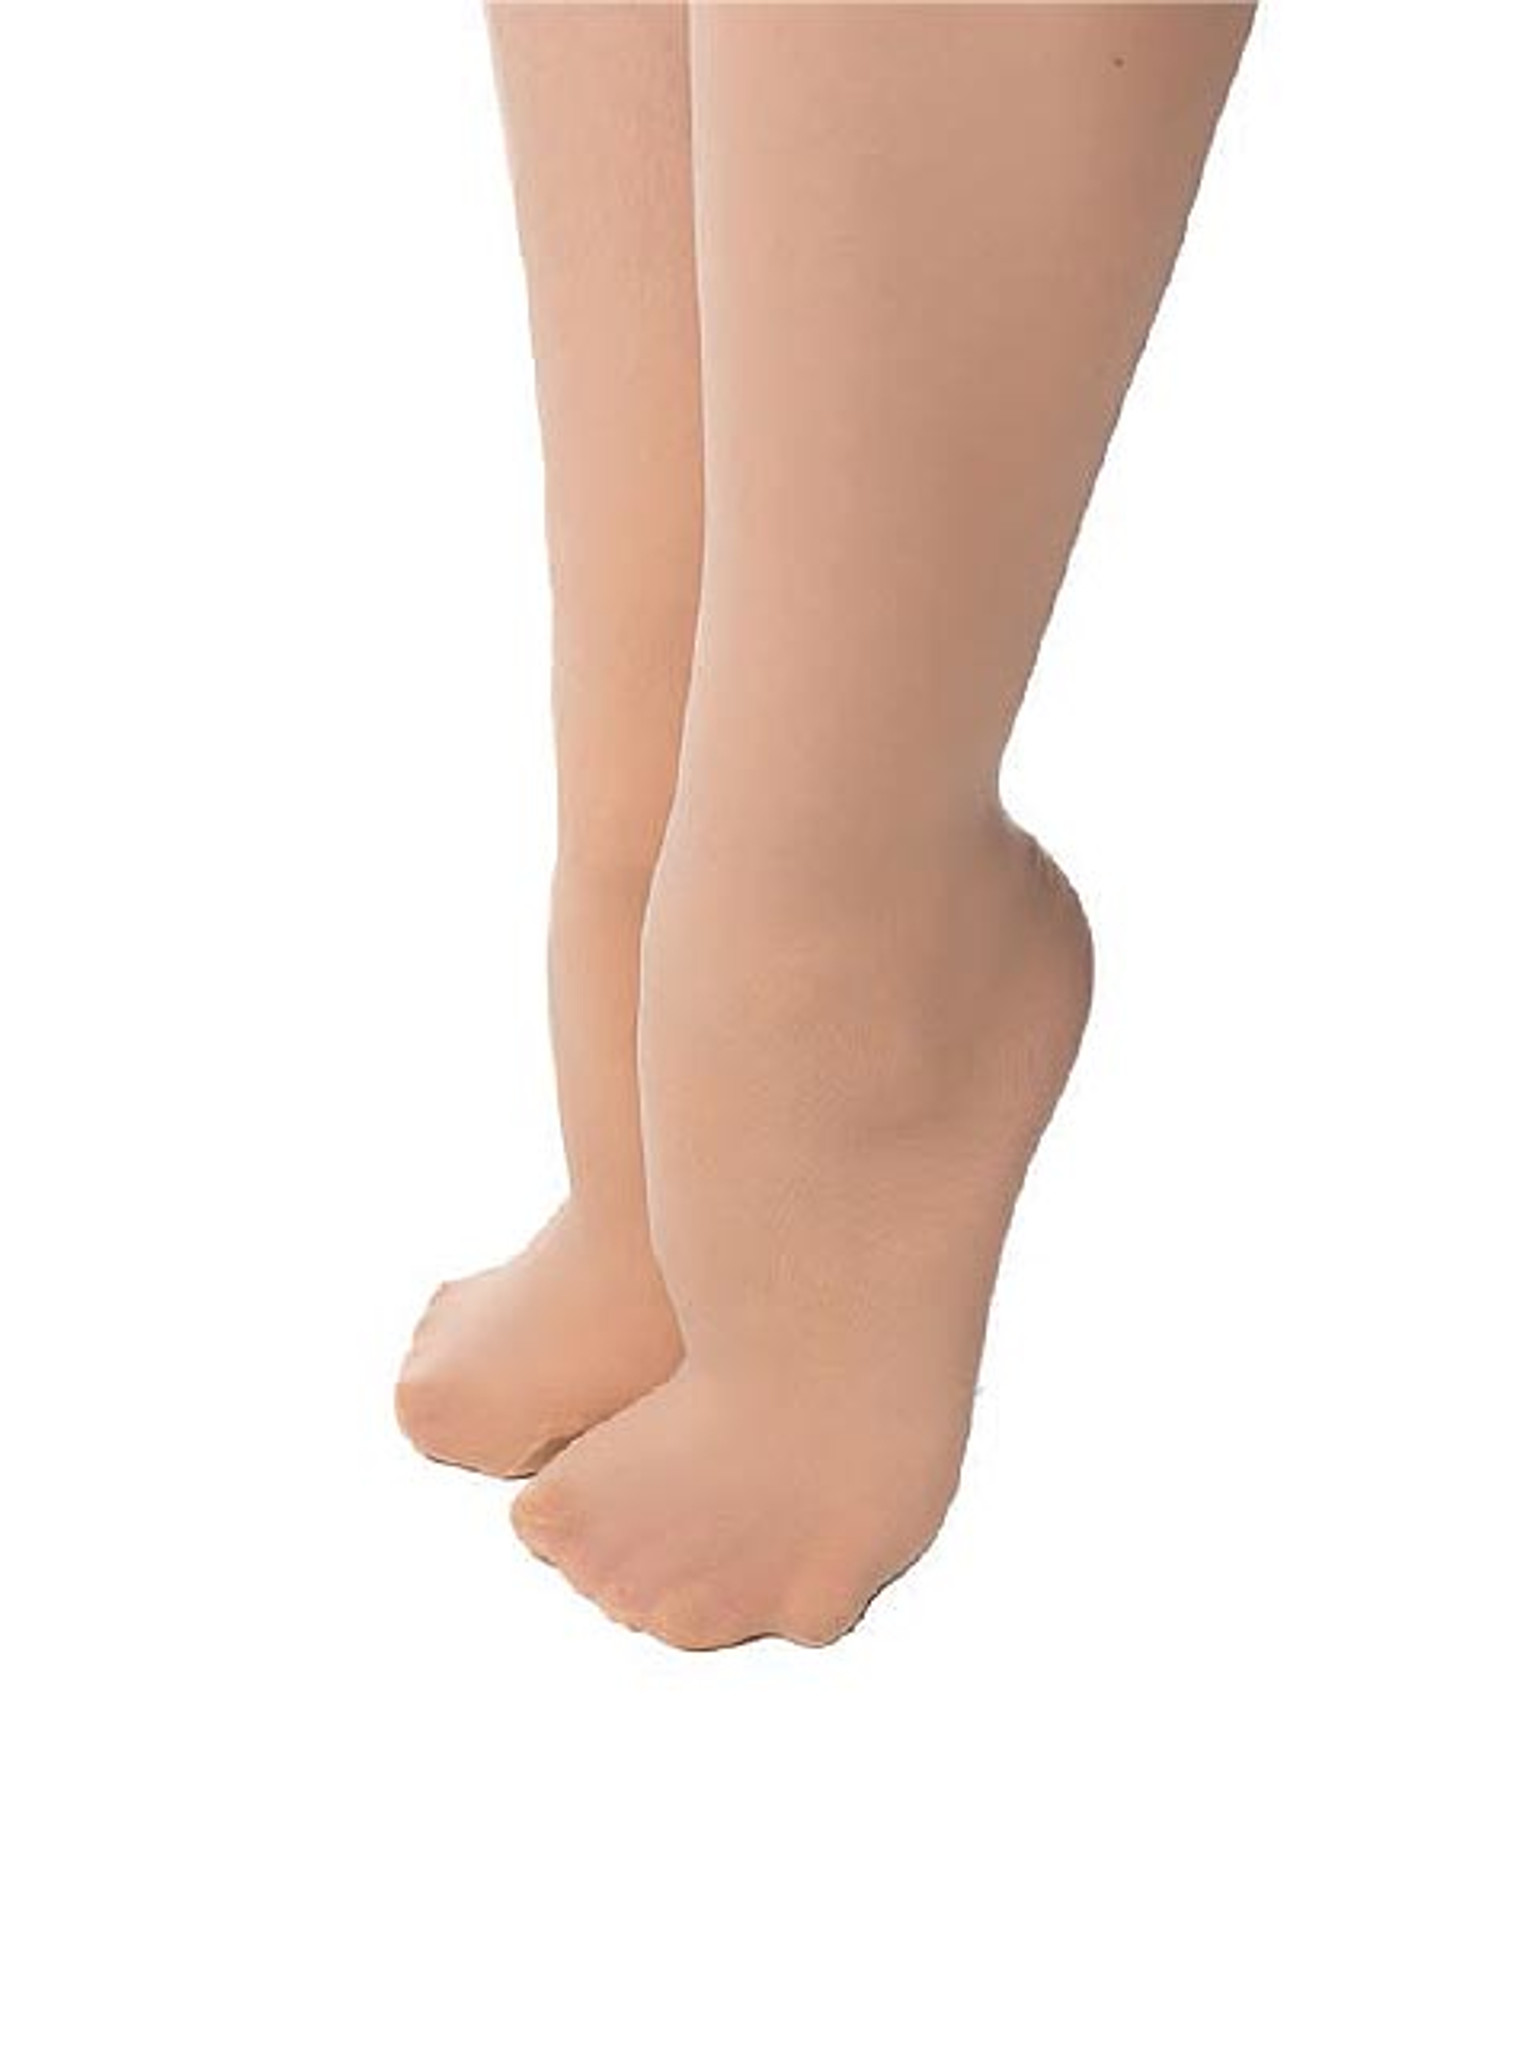 ff6c190182444 Studio 7 Dancewear Footed Ballet Tights Girls - DANCE DIRECT®